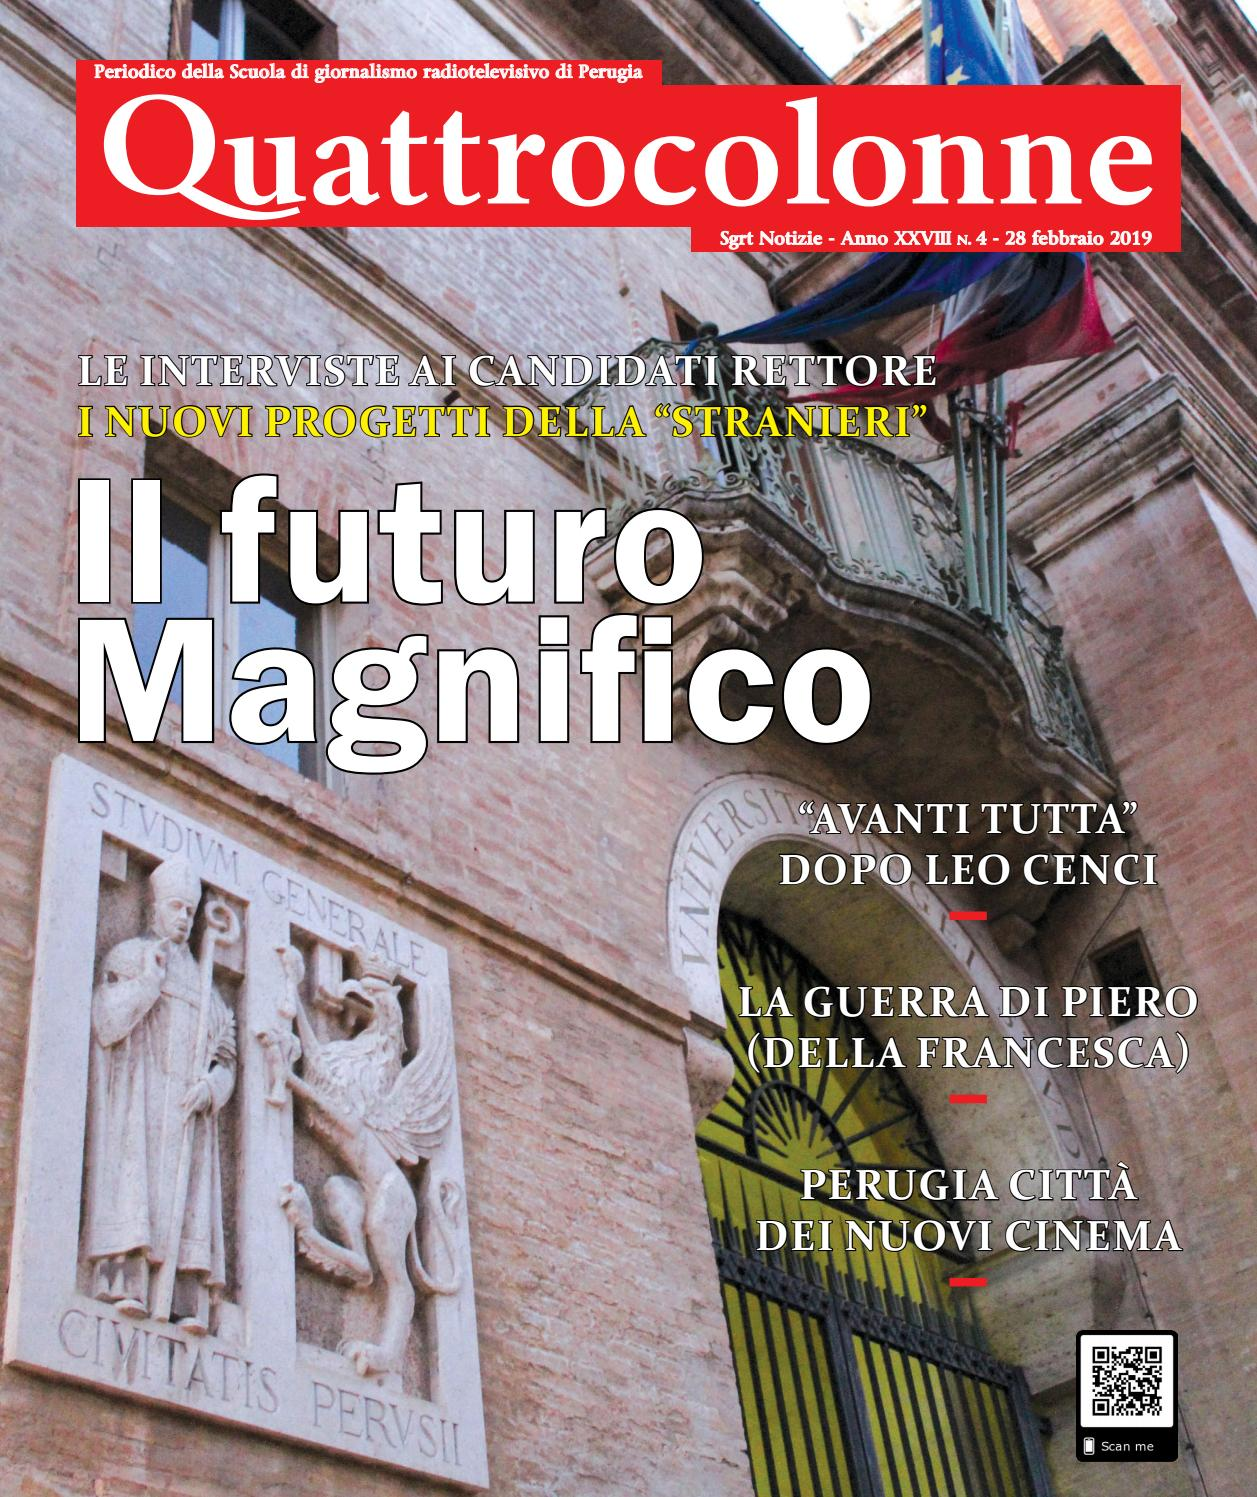 Calendario Esami Unipg Economia.Numero 4 28 Febbraio 2019 By Quattrocolonne Issuu